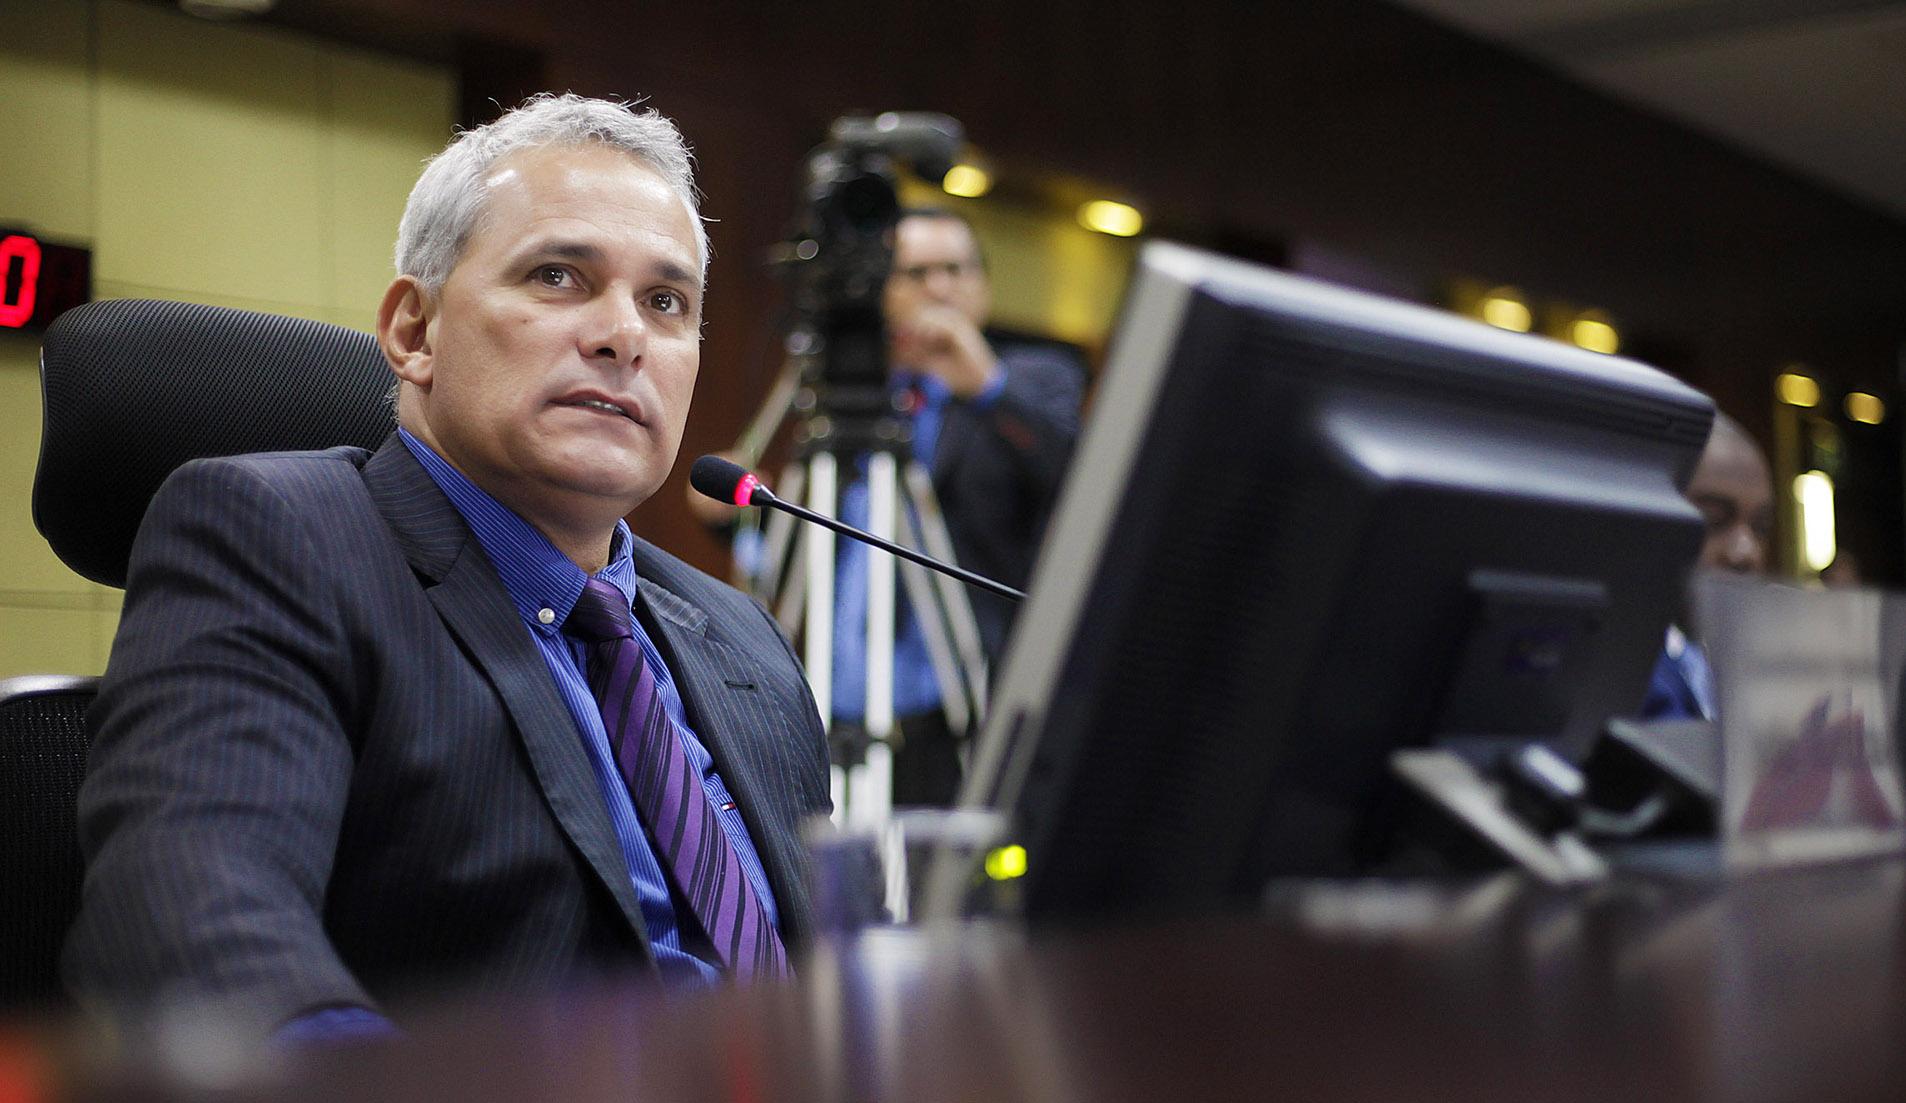 Conselheiro interino do TCE-MT - Joao Batista Camargo